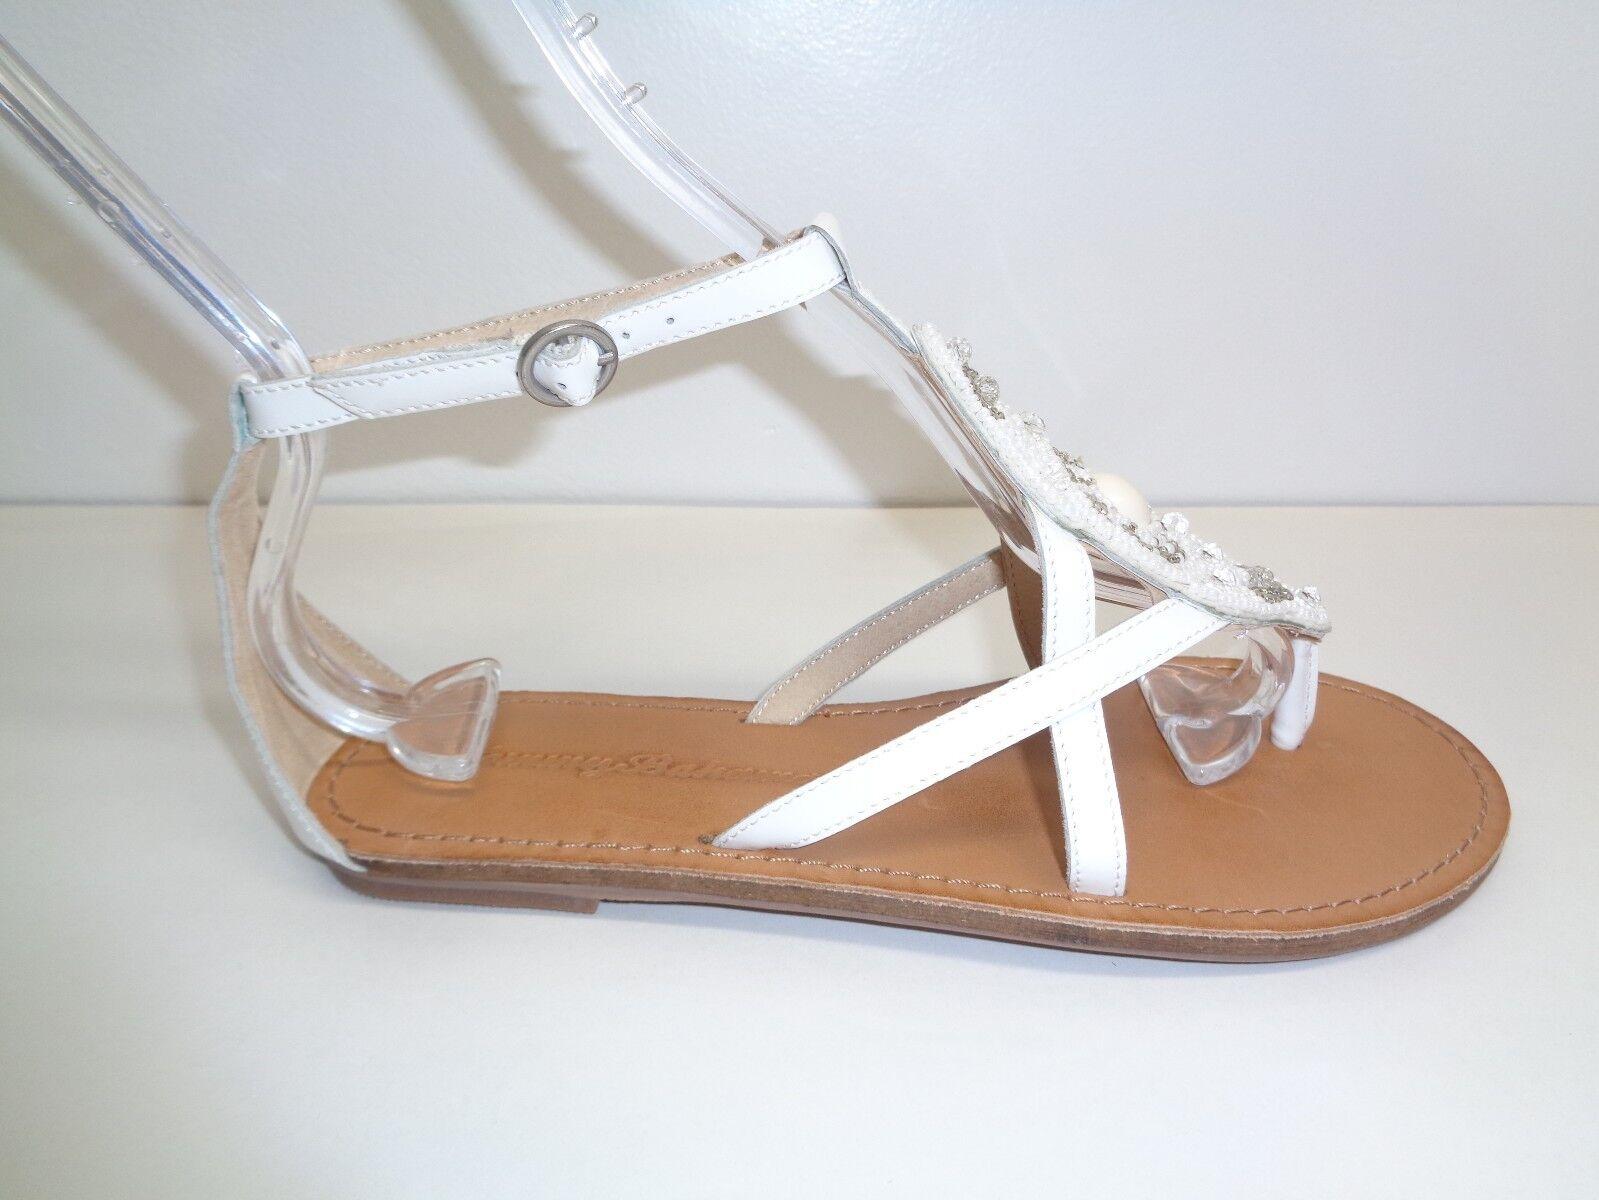 Tommy Bahama Größe 5 PRIMROSE WEISS Leder Beads Sandales NEU Damenschuhe Schuhes